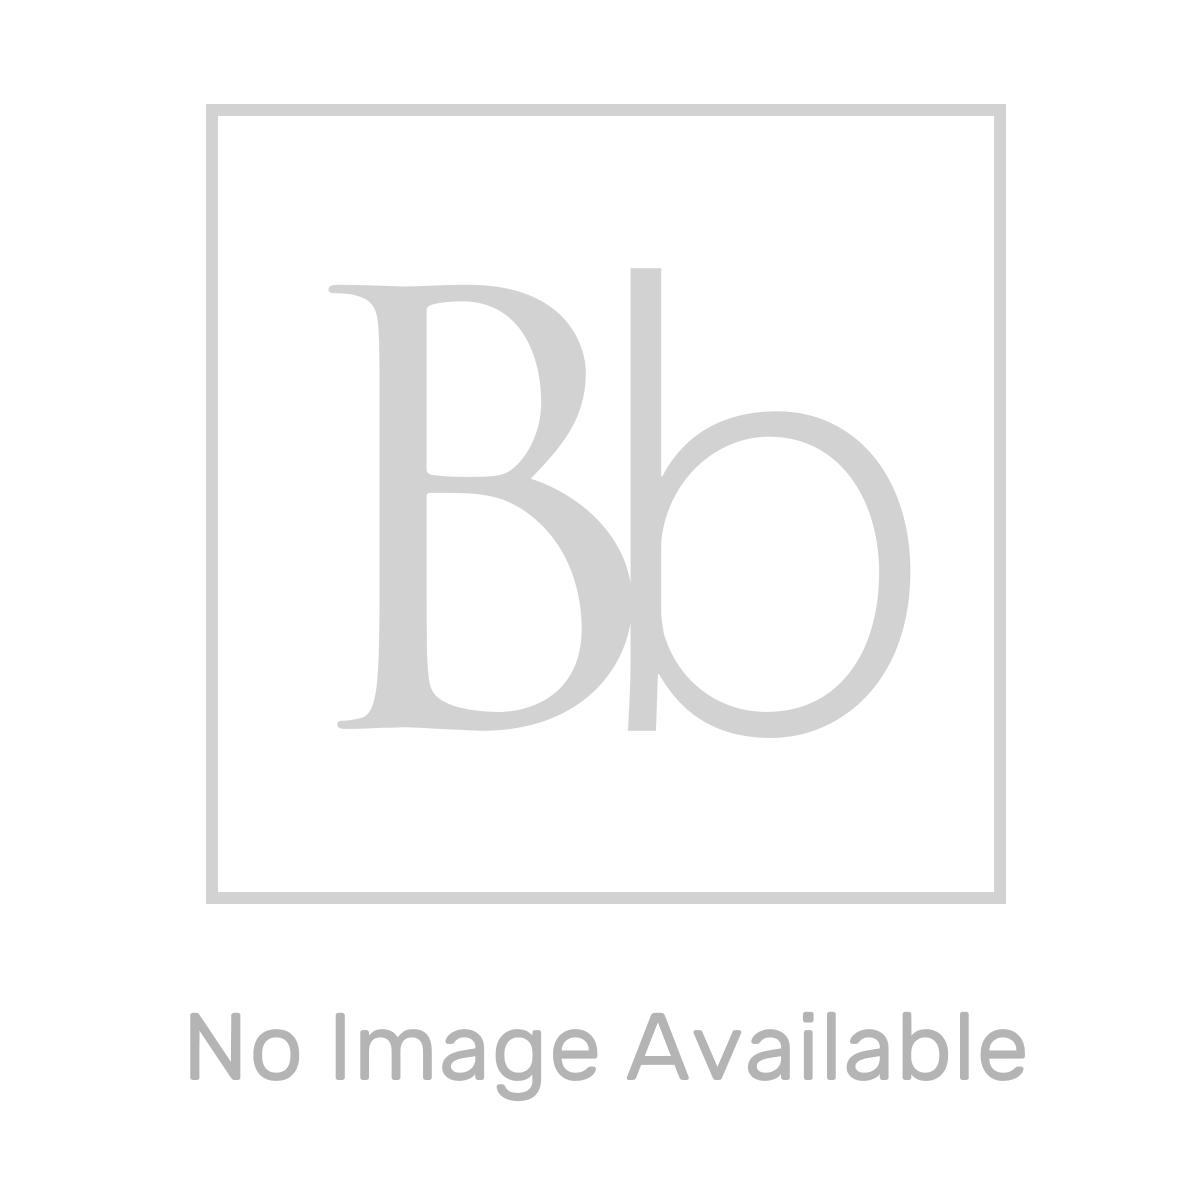 BTL Lambra White Gloss 2 Door Tall Unit 350mm